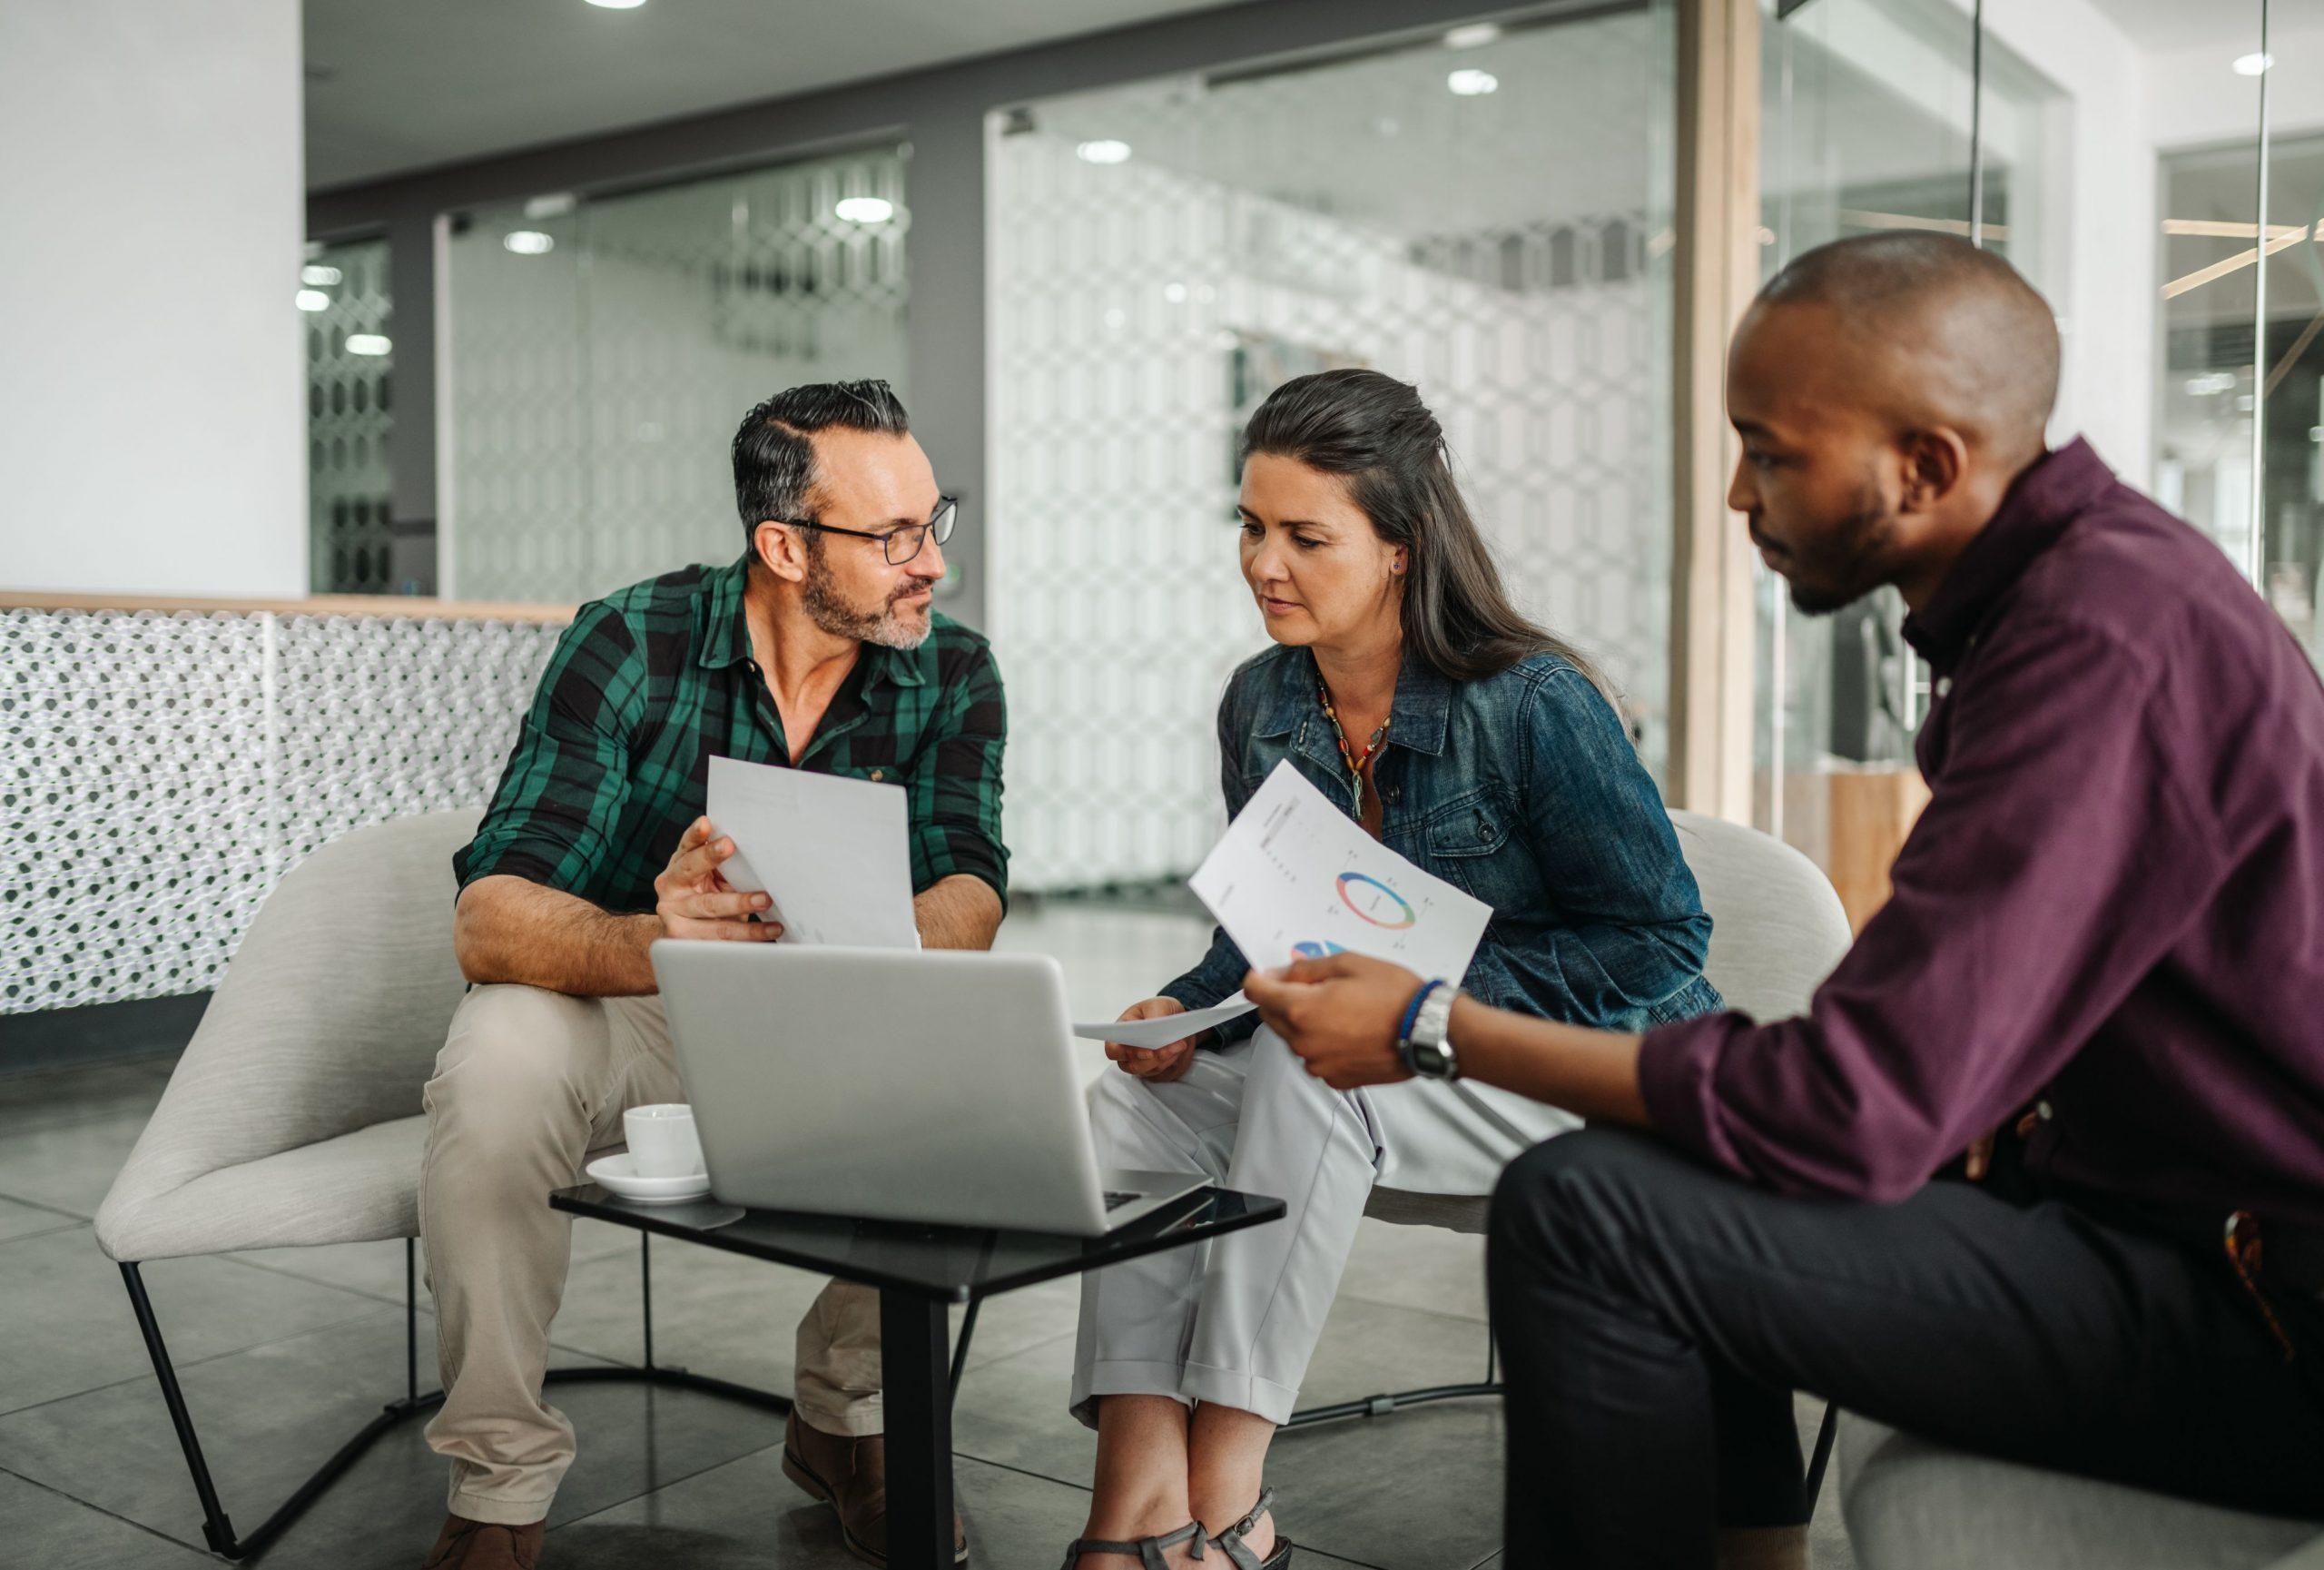 conseillers financiers rencontre repentigny